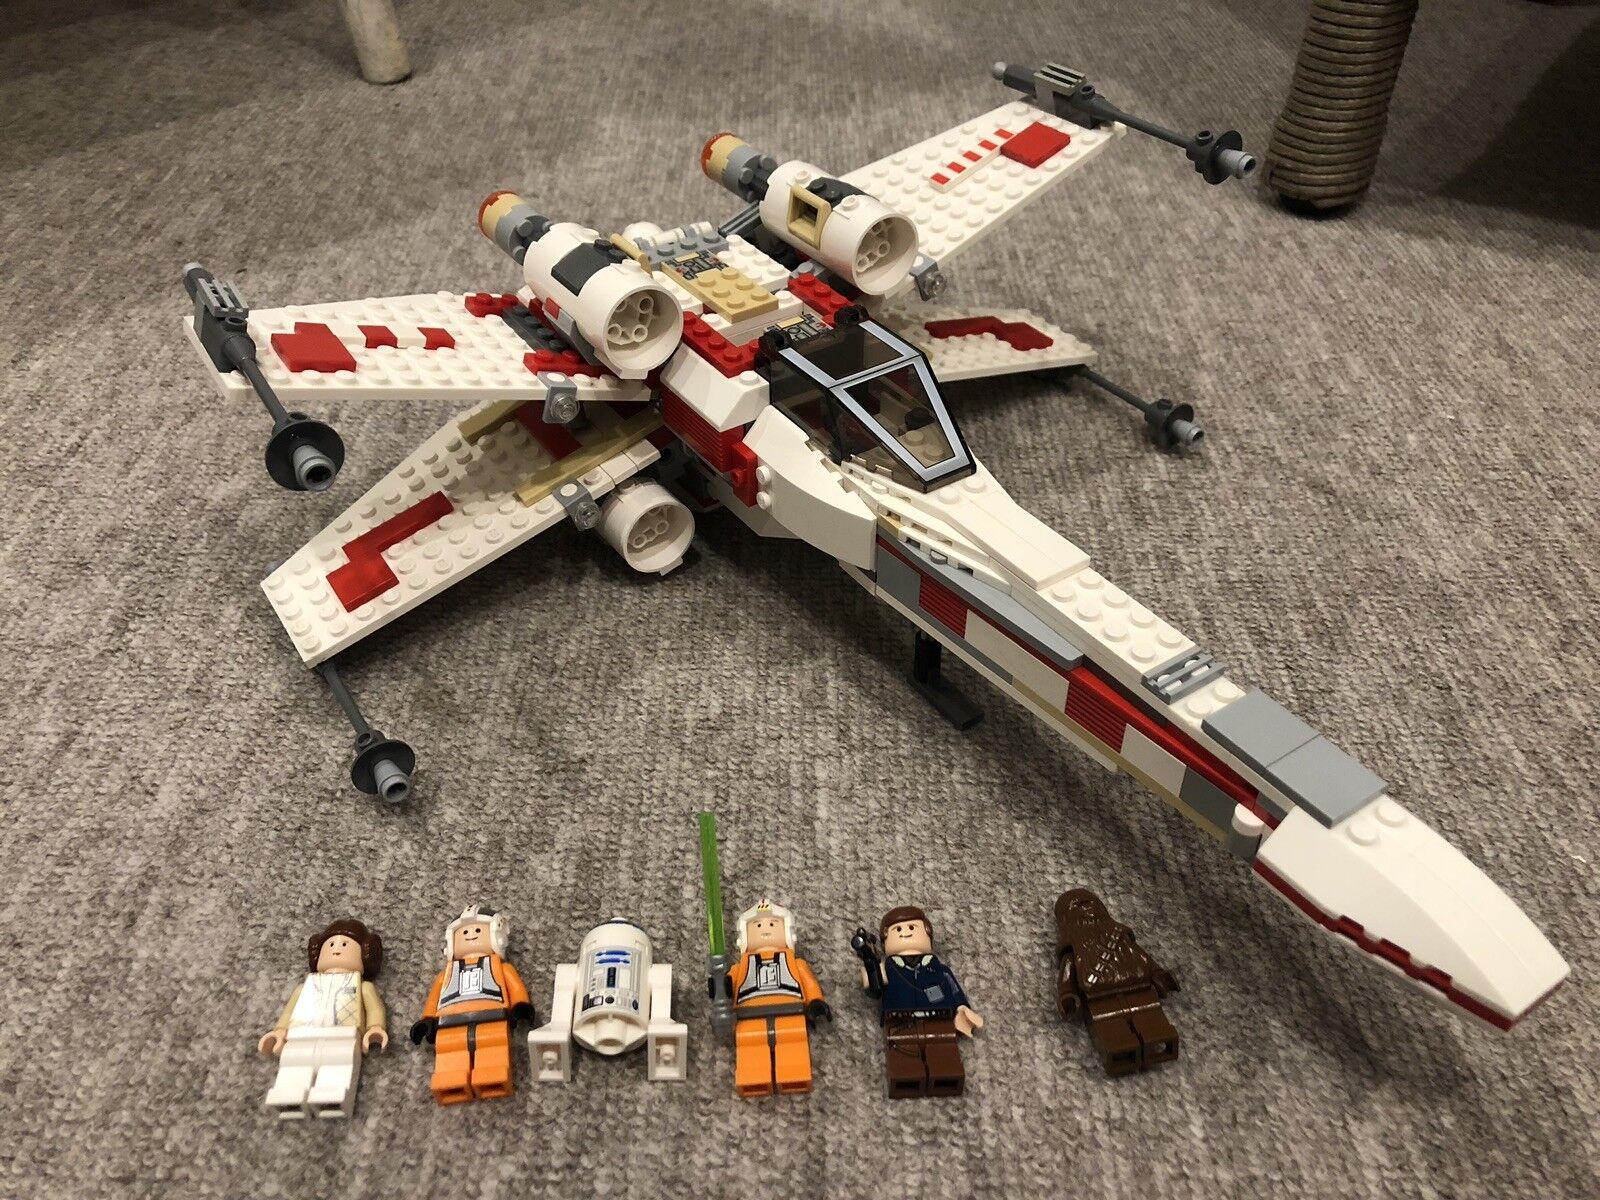 Lego Star Wars Wars Wars X-Wing Vintage Collection Set avec Minifigures - 6212 689464